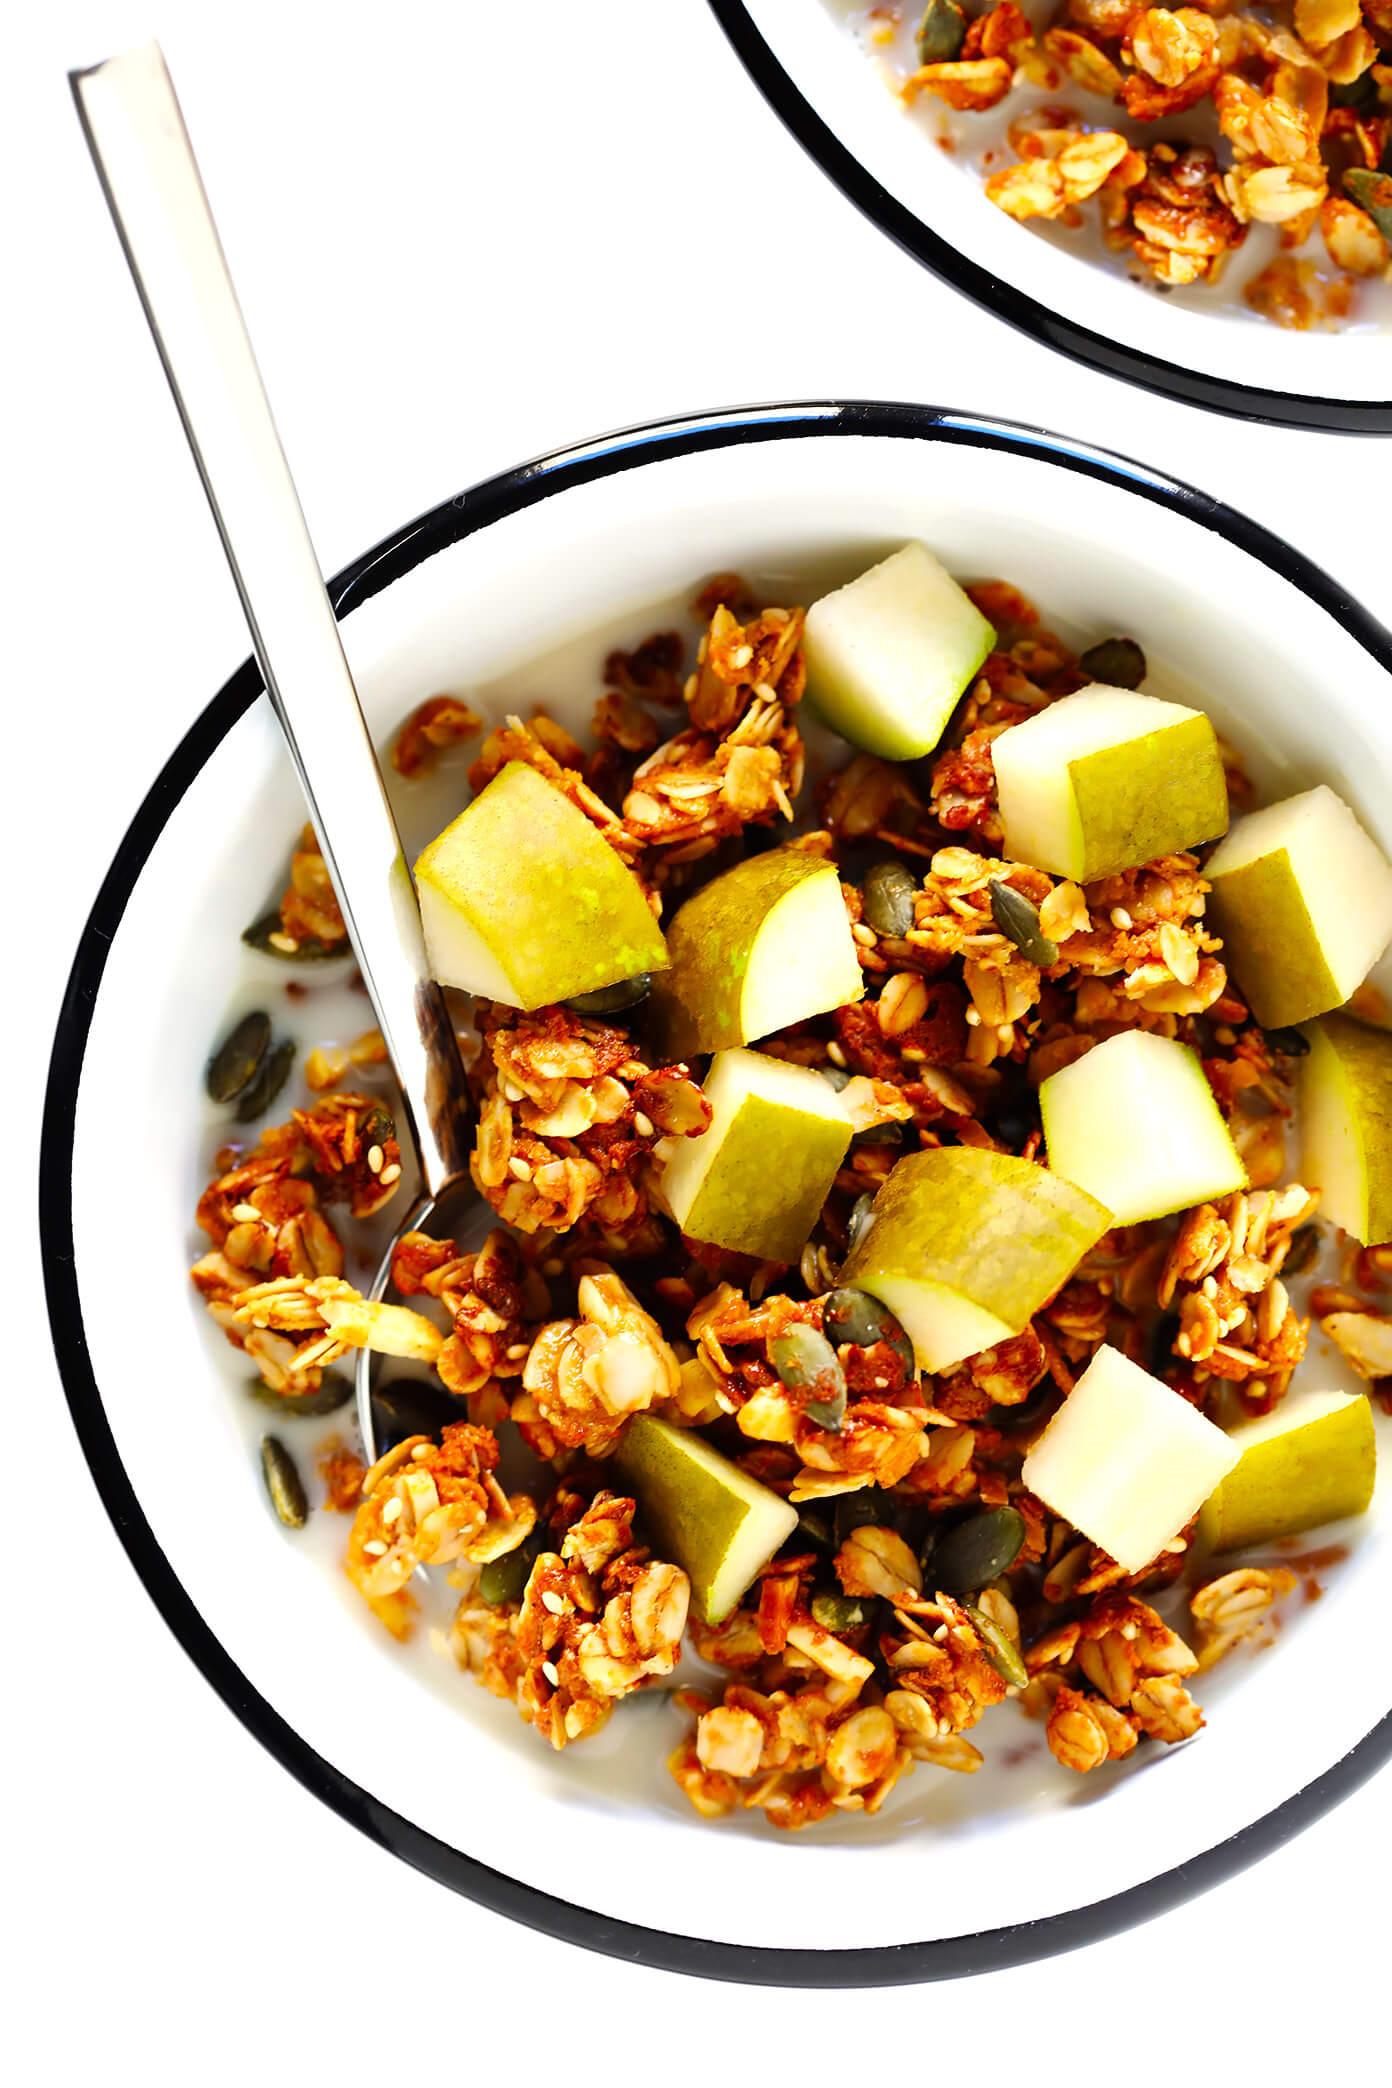 Tahini Granola with Almond Milk and Pears